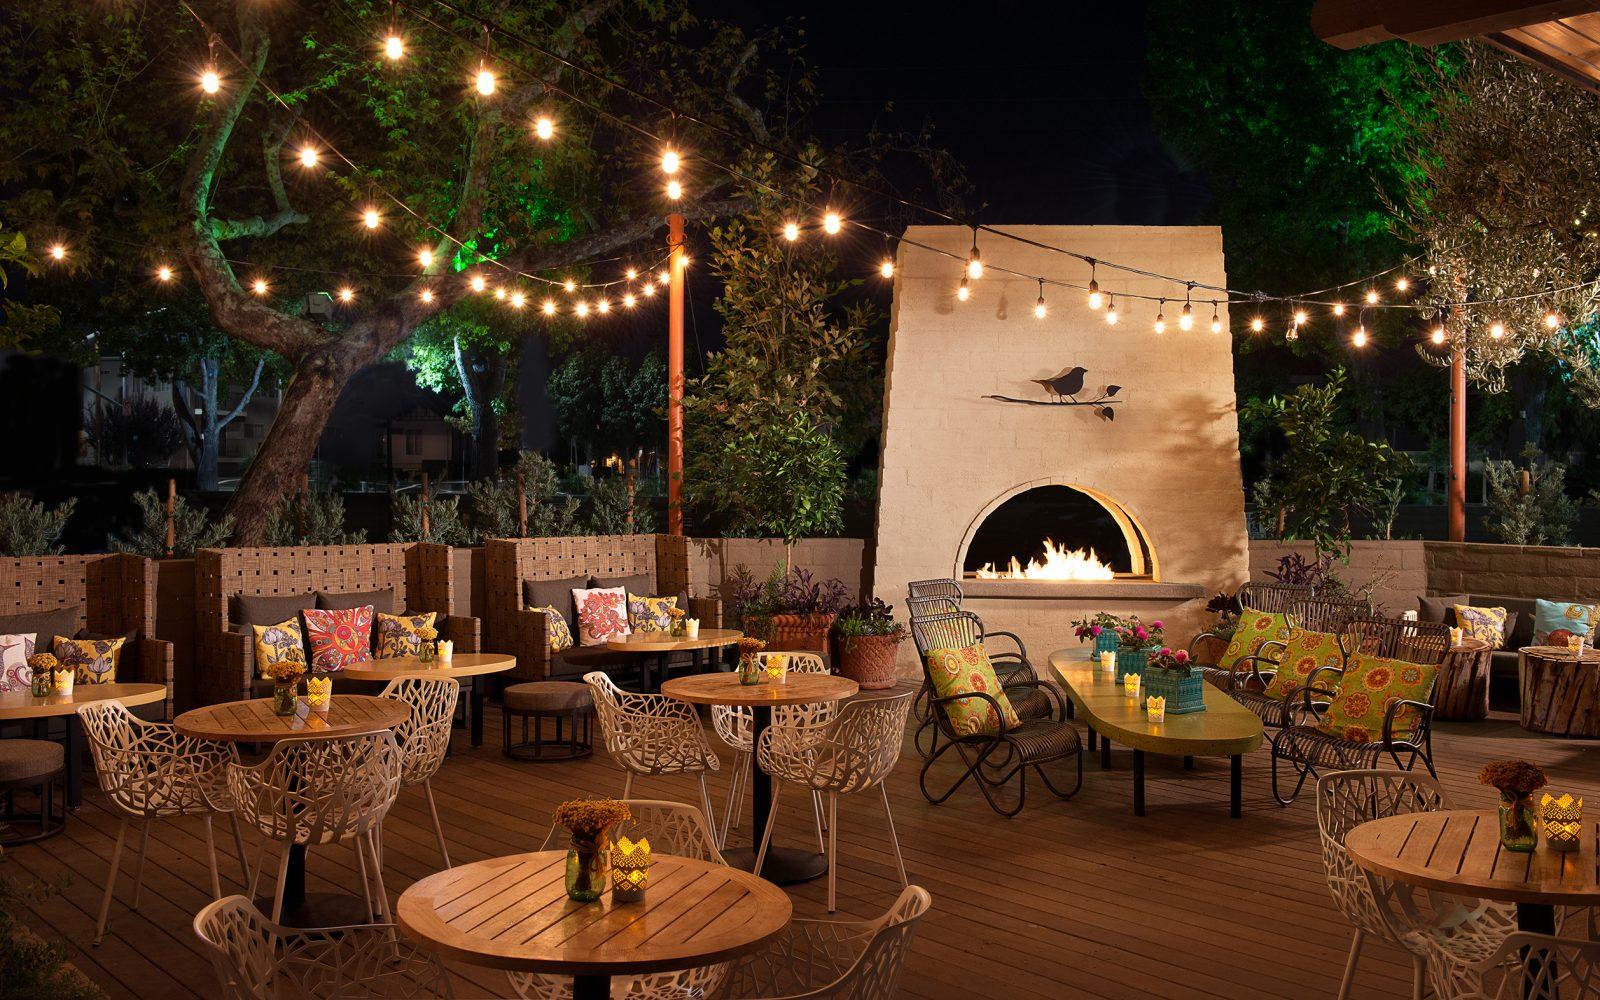 hotel near universal studios - Los Angeles Forum - TripAdvisor